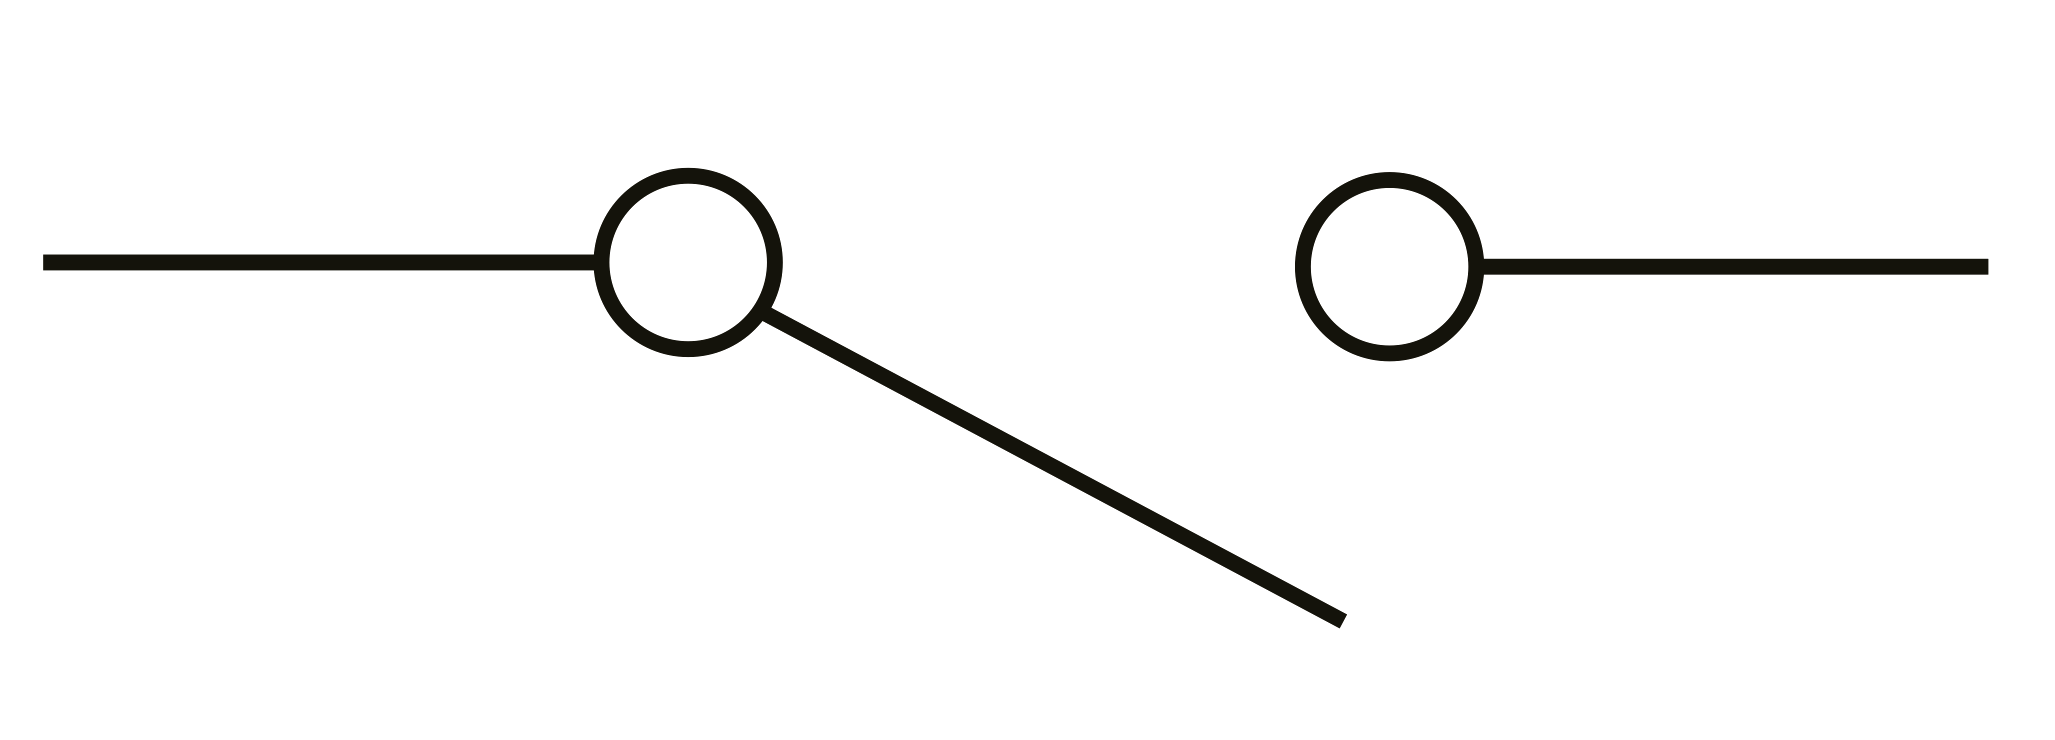 voltmeter symbol